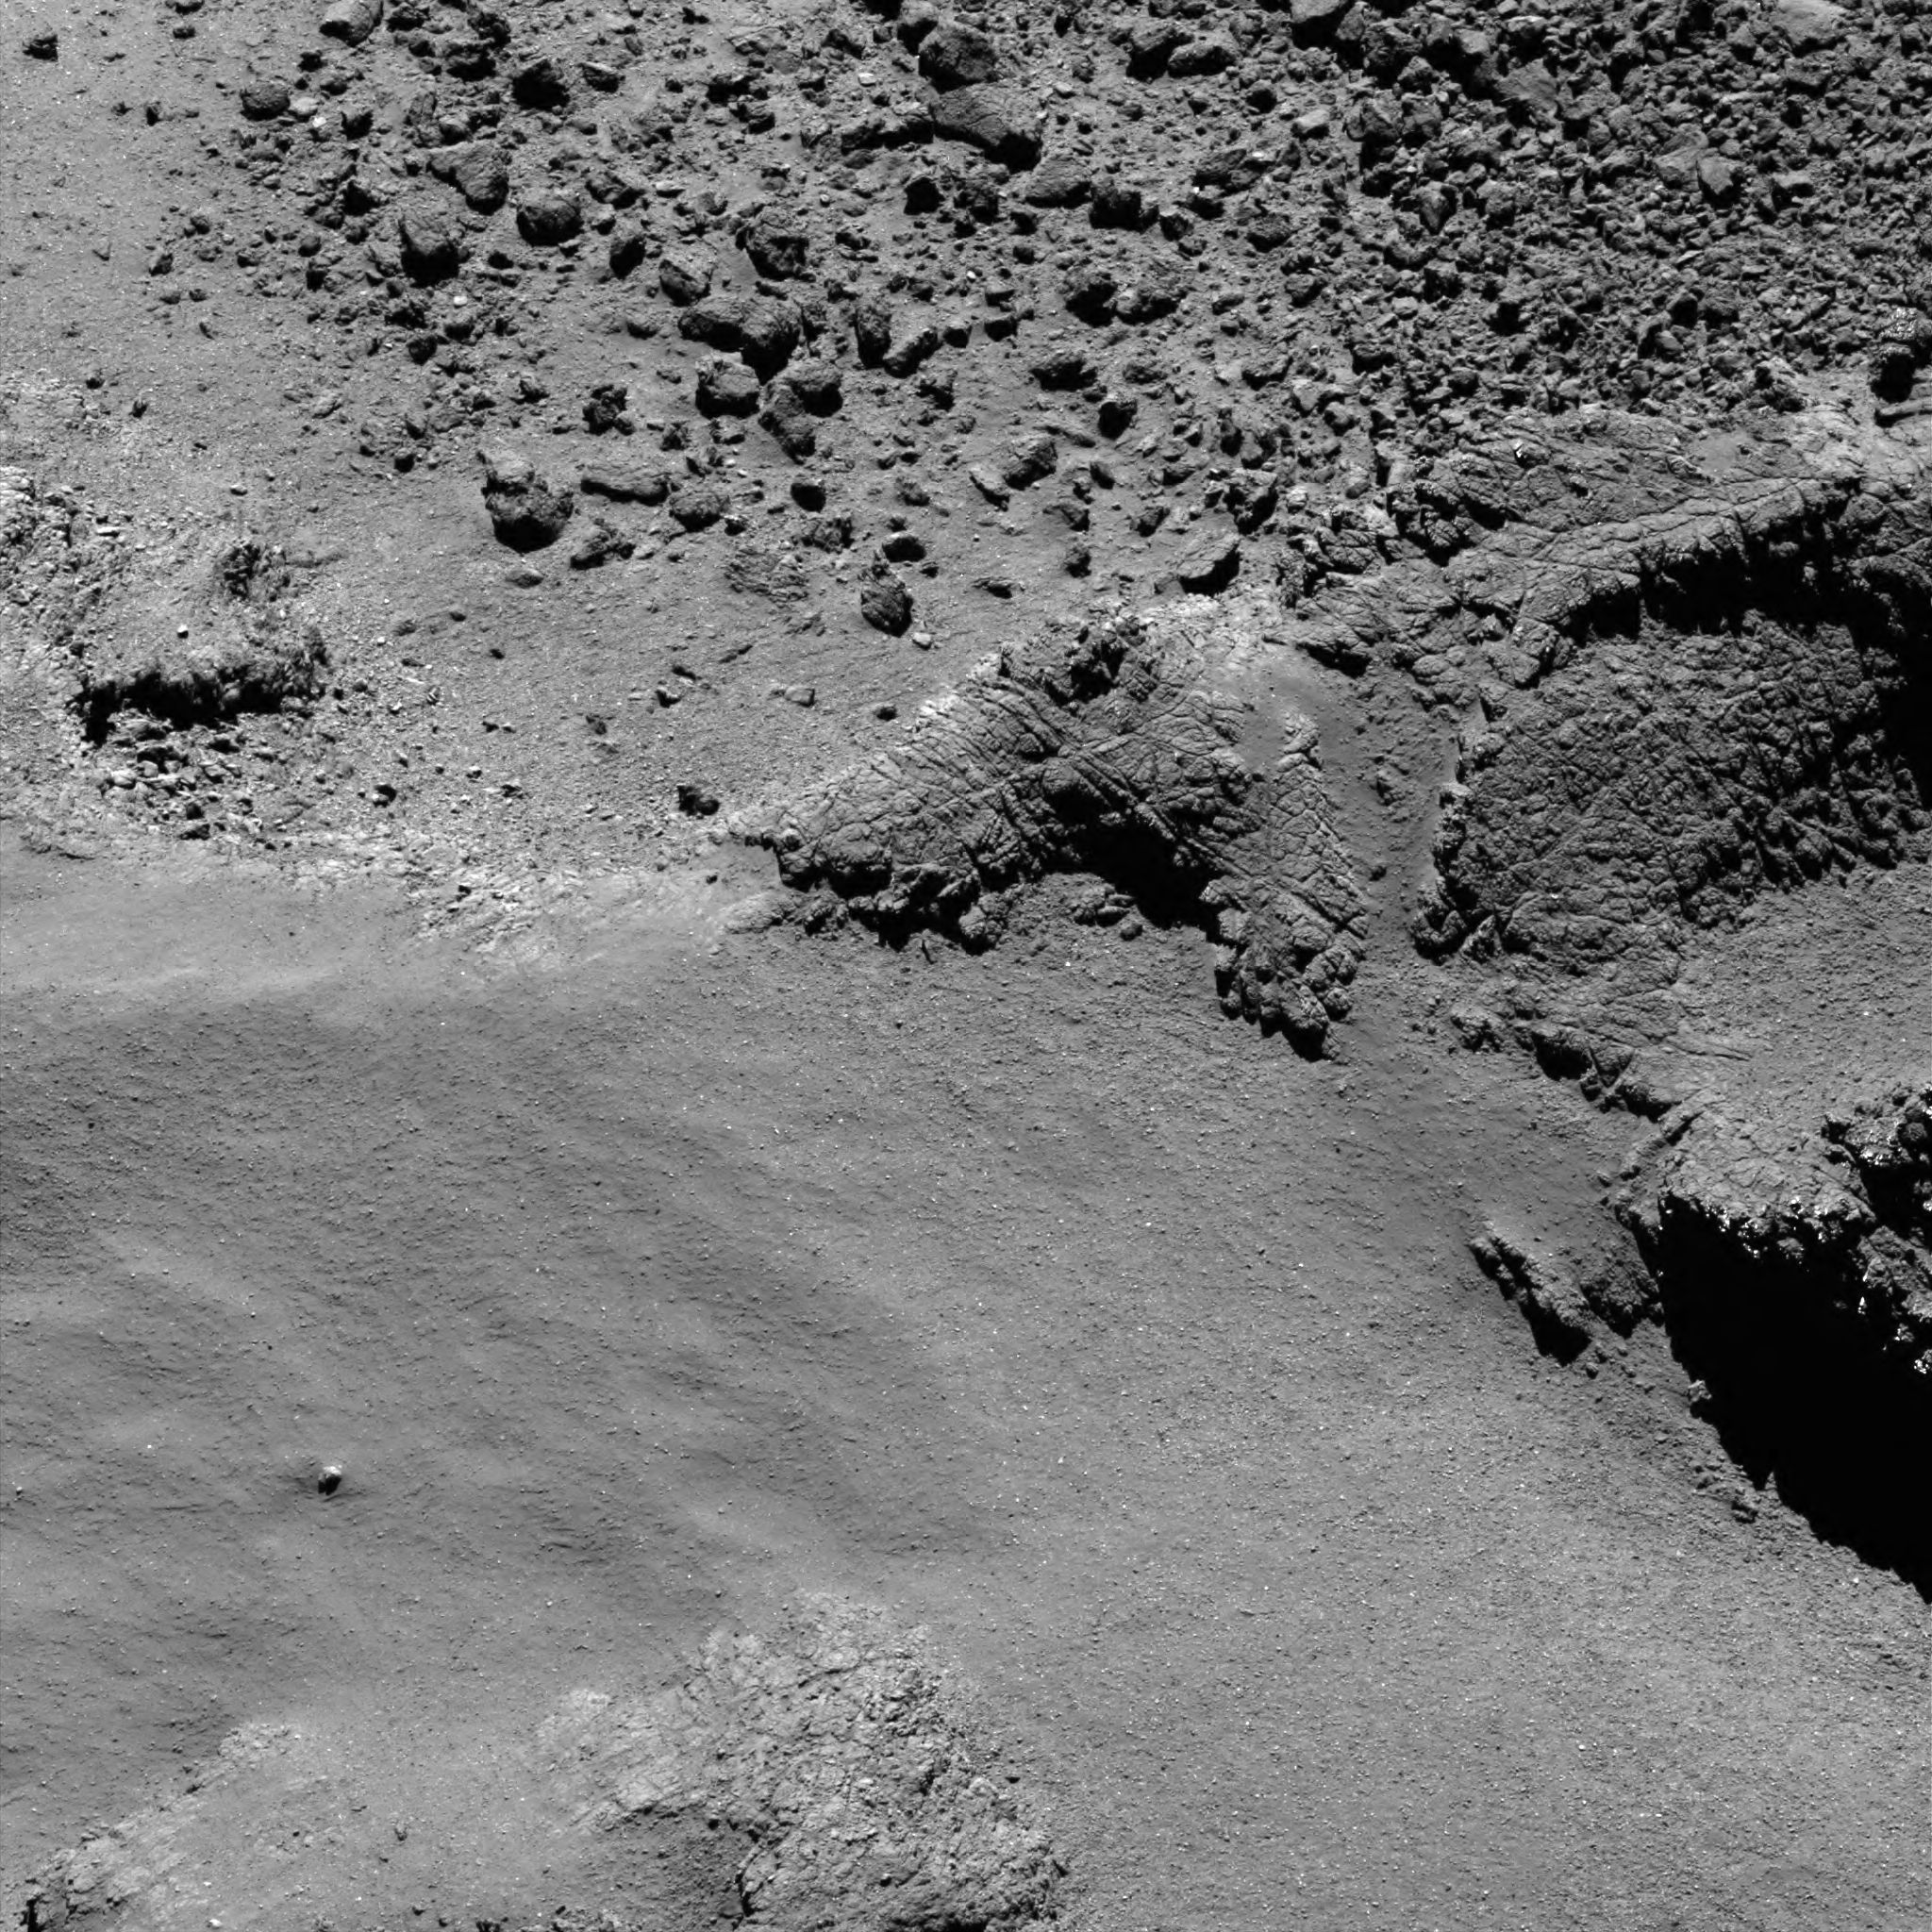 1567215338093-Rosetta_OSIRIS_NAC_comet_67P_20160803T074834.jpg